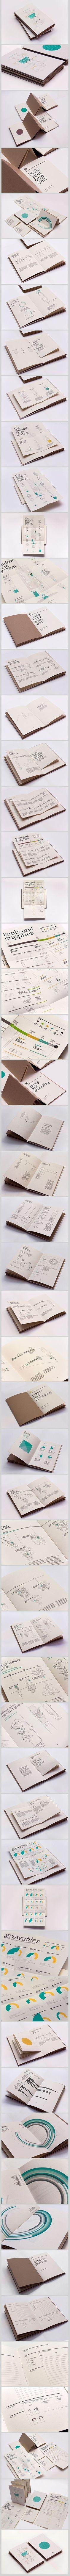 Window Farms: Information Design Book by Jiani Lu on Béhance - Editorial / Print… Web Design, Graphic Design Layouts, Layout Design, Creative Design, Flyer Layout, Brochure Layout, Editorial Design, Editorial Layout, Informations Design